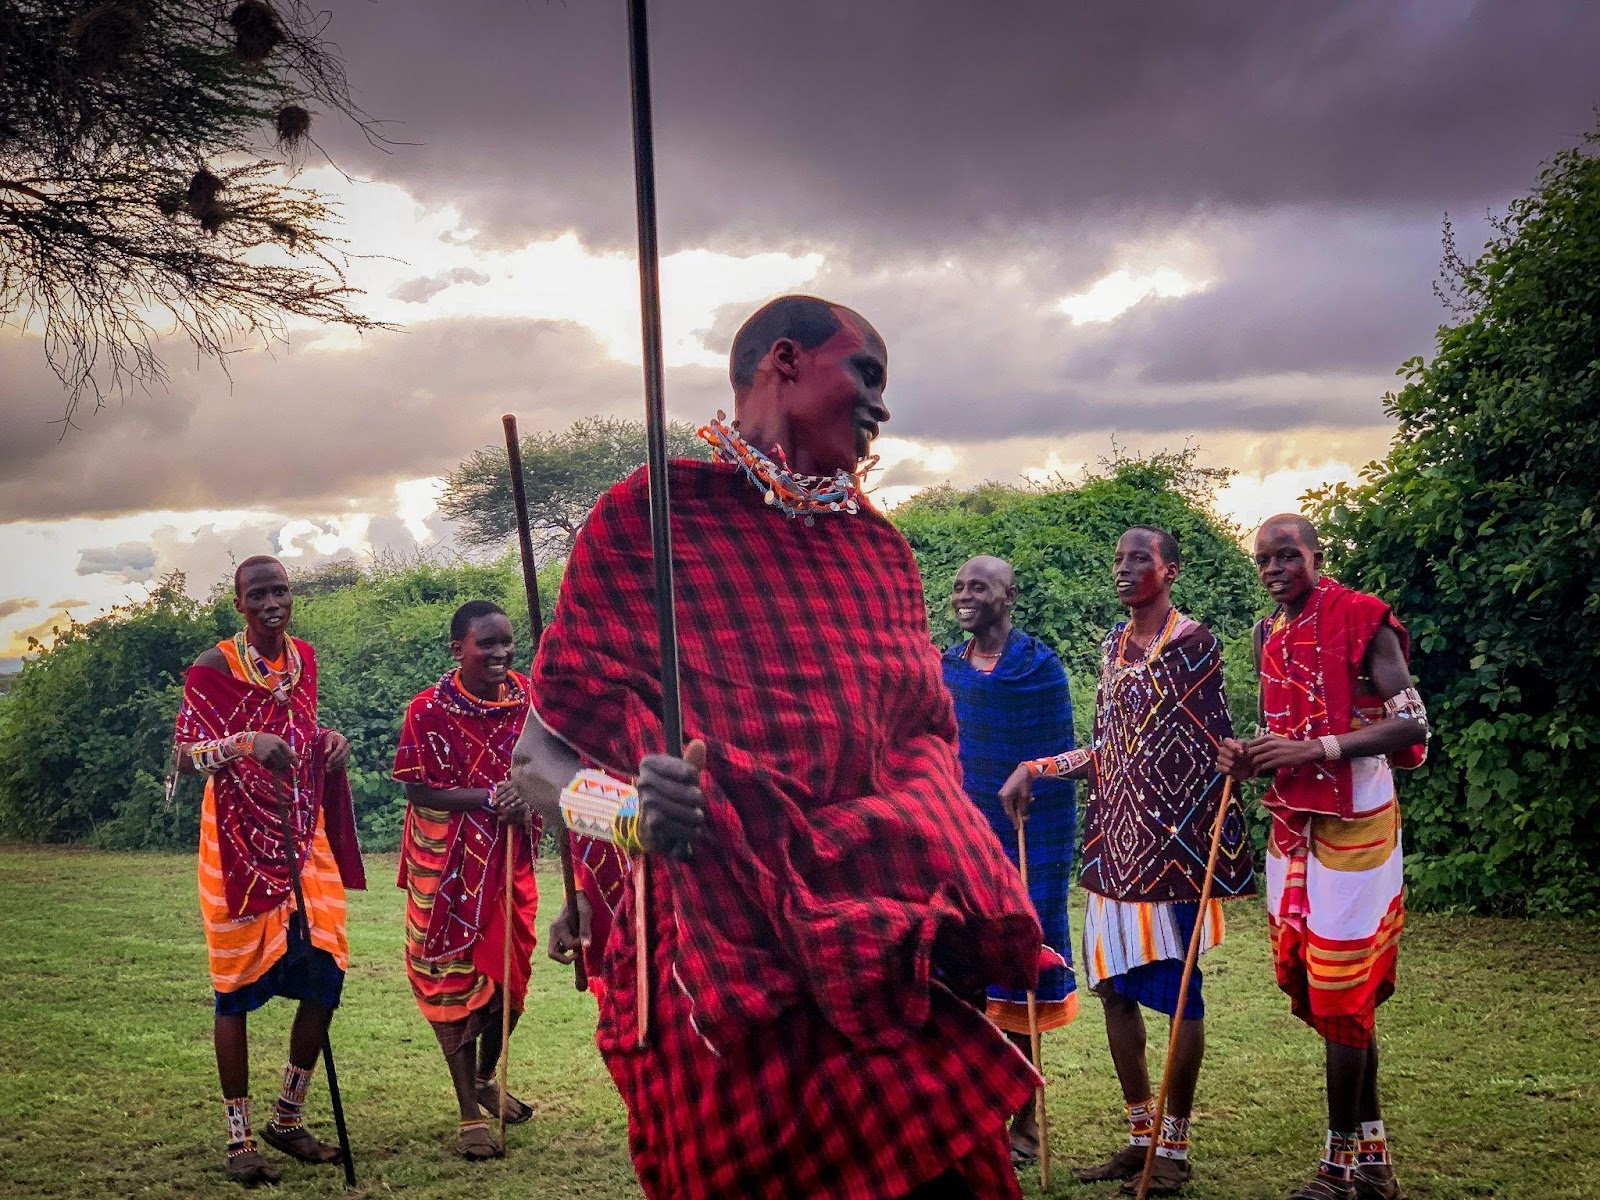 Meeting with the Maasai people. - photo by Ryan Frederick Wiramidjaja